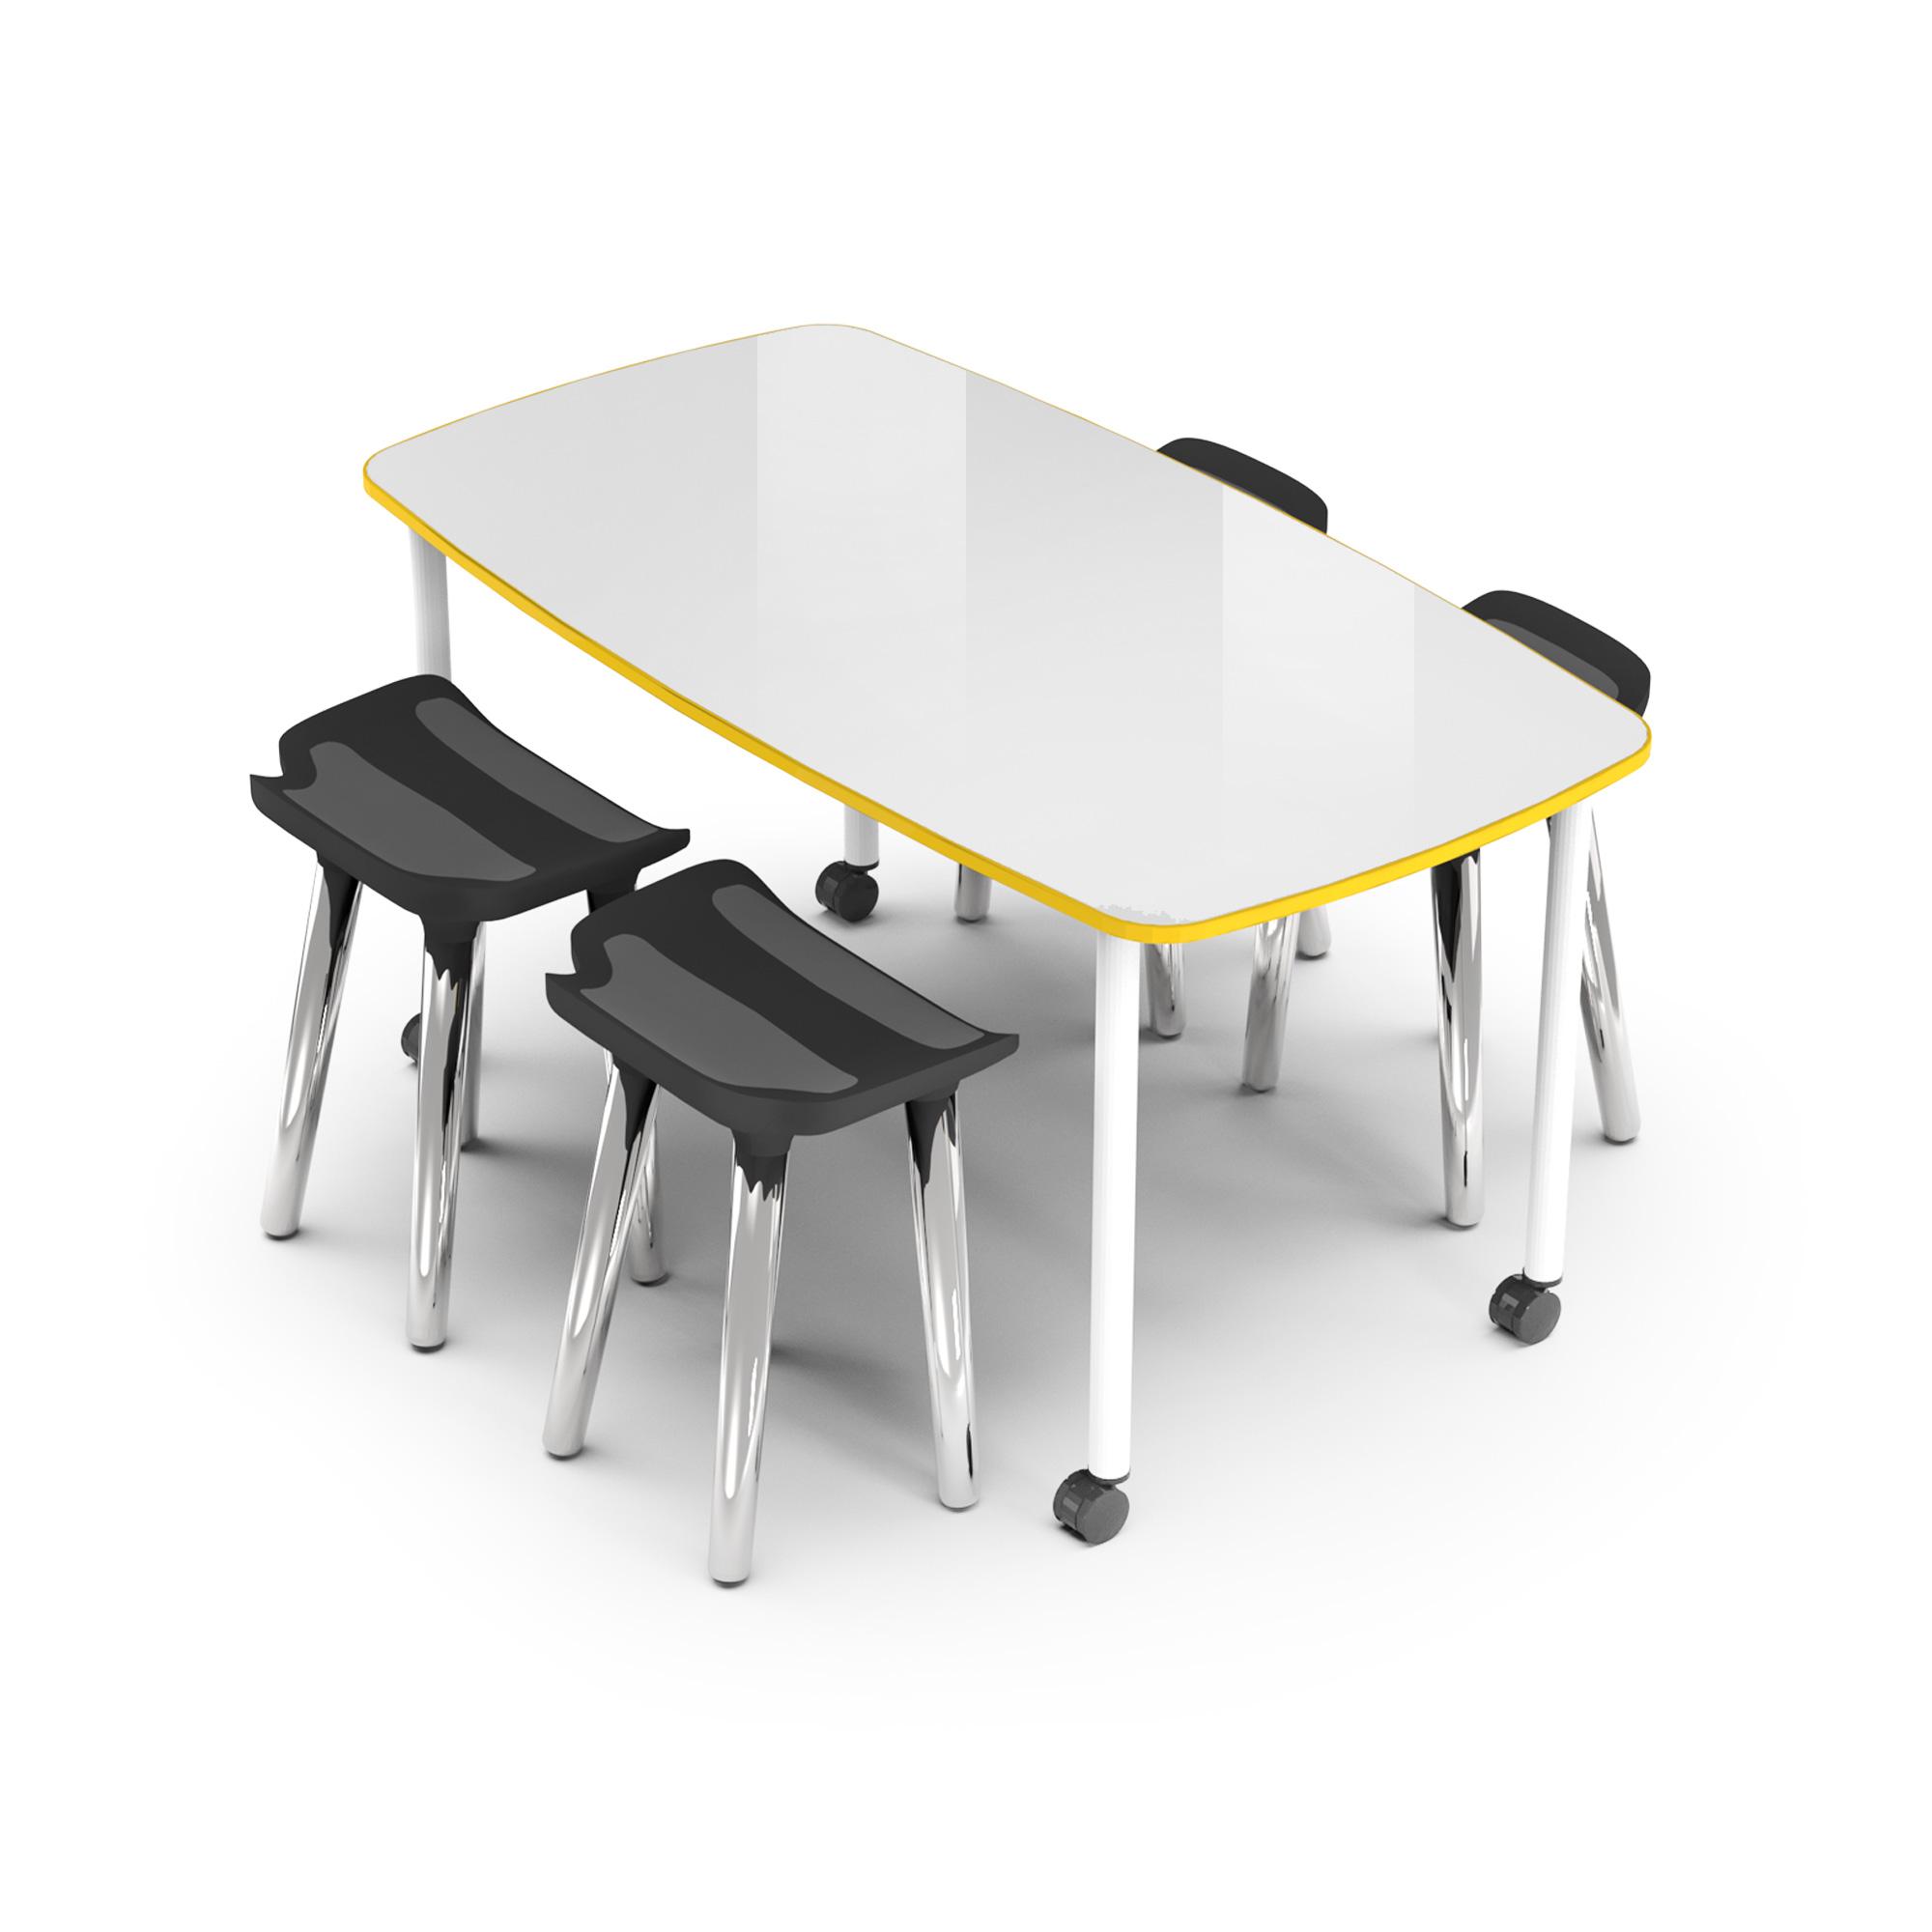 Tech Jnr Collection C058 | Beparta Flexible School Furniture